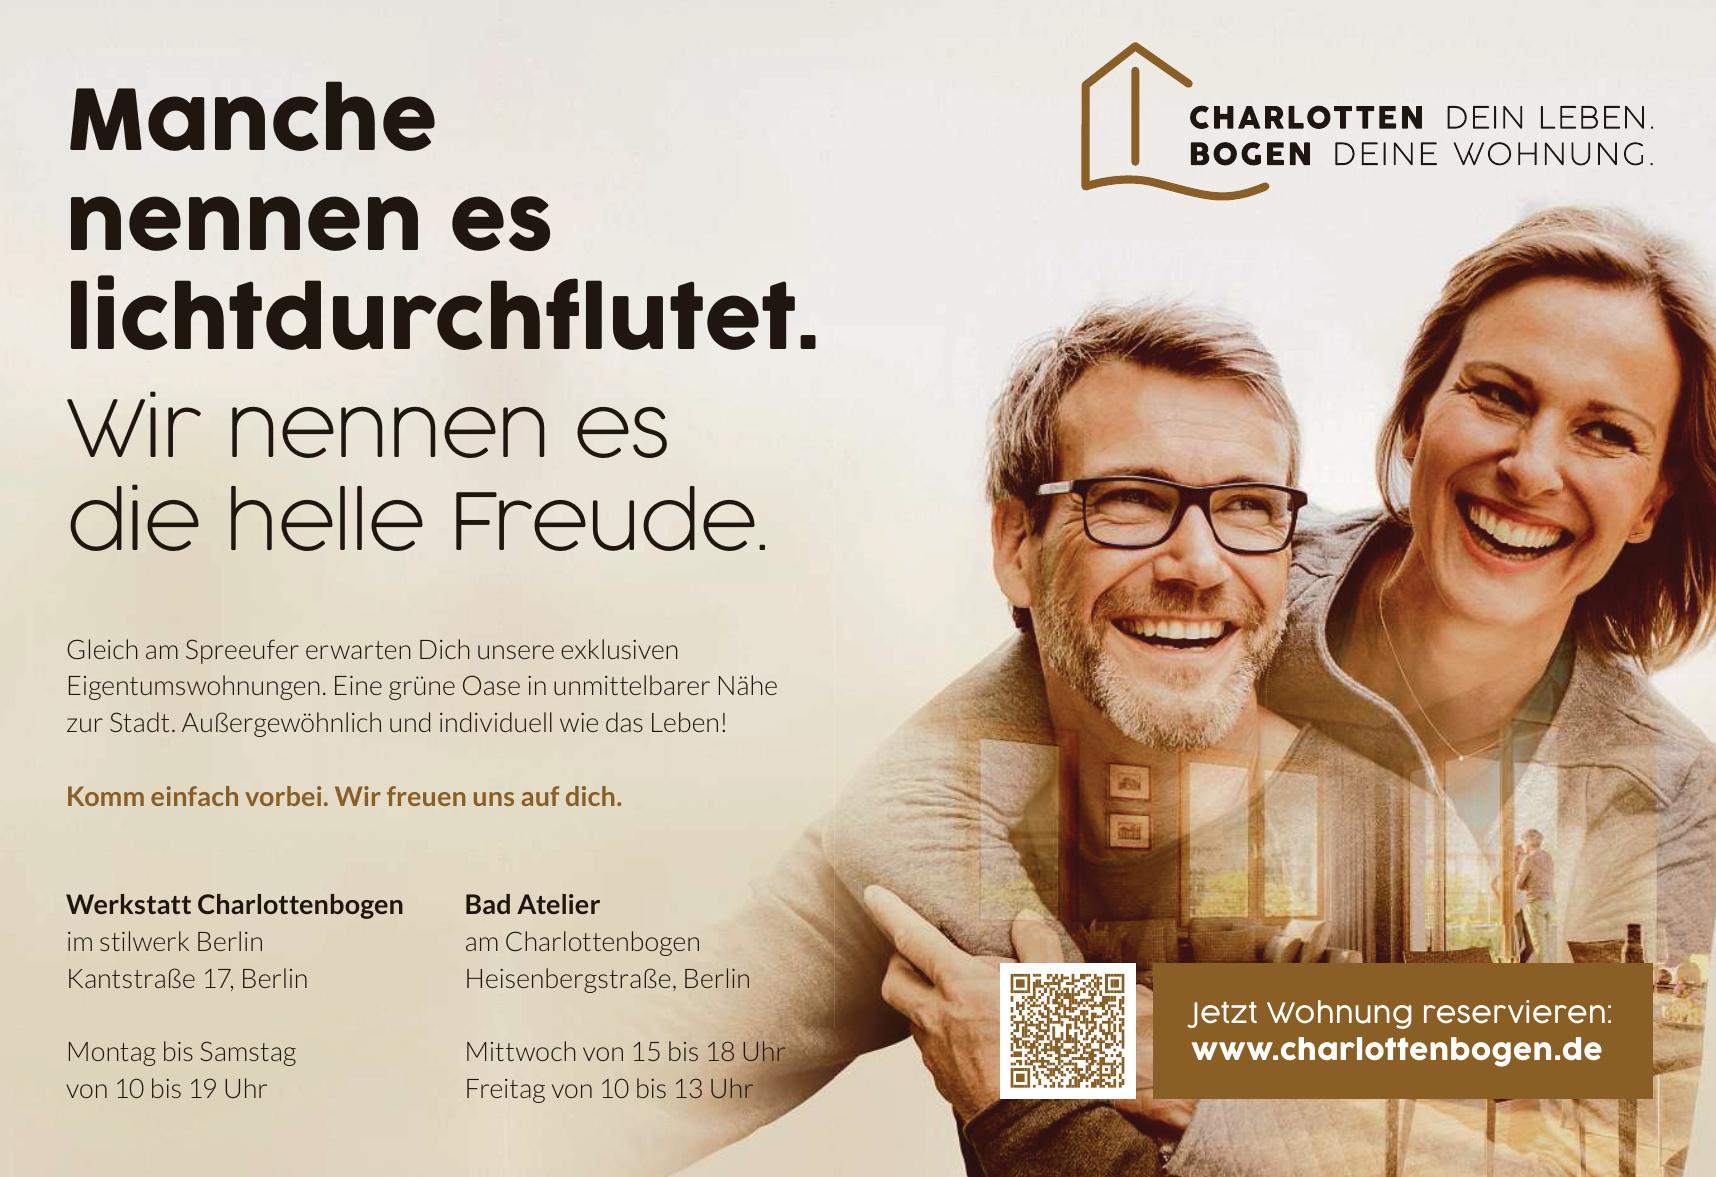 Werkstatt Charlottenbogen